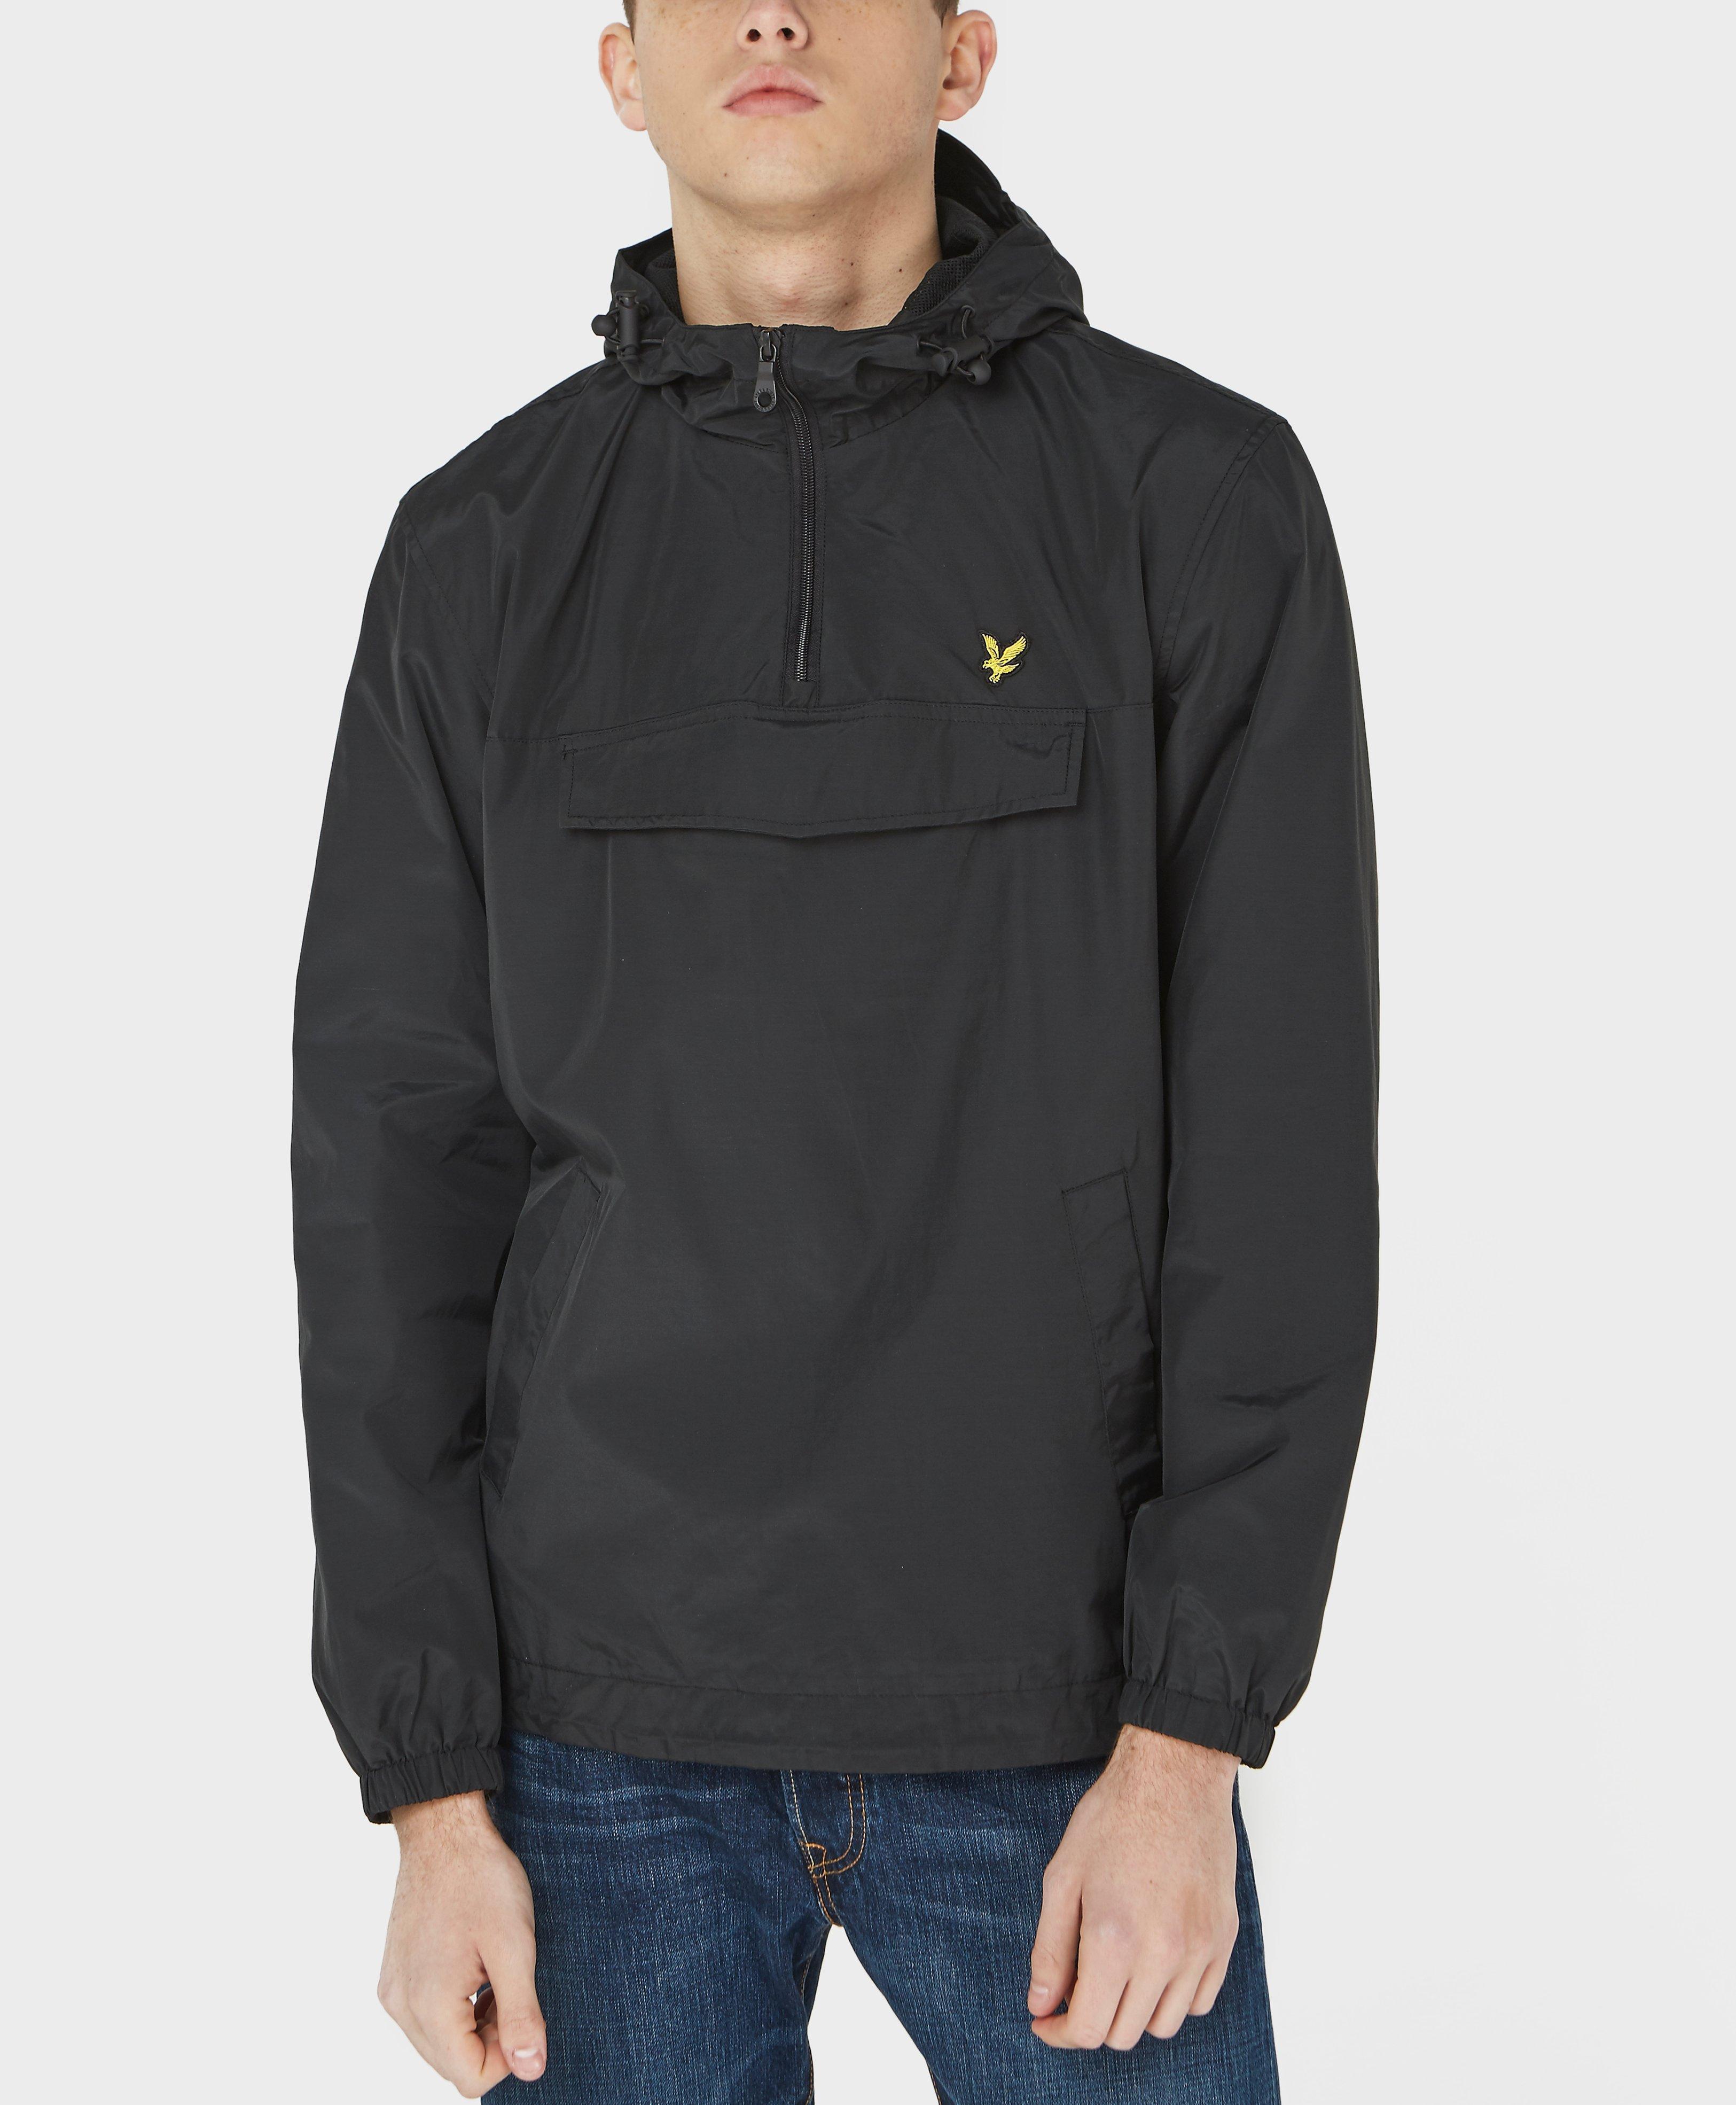 Lyle Amp Scott Overhead Lightweight Jacket For Men Lyst